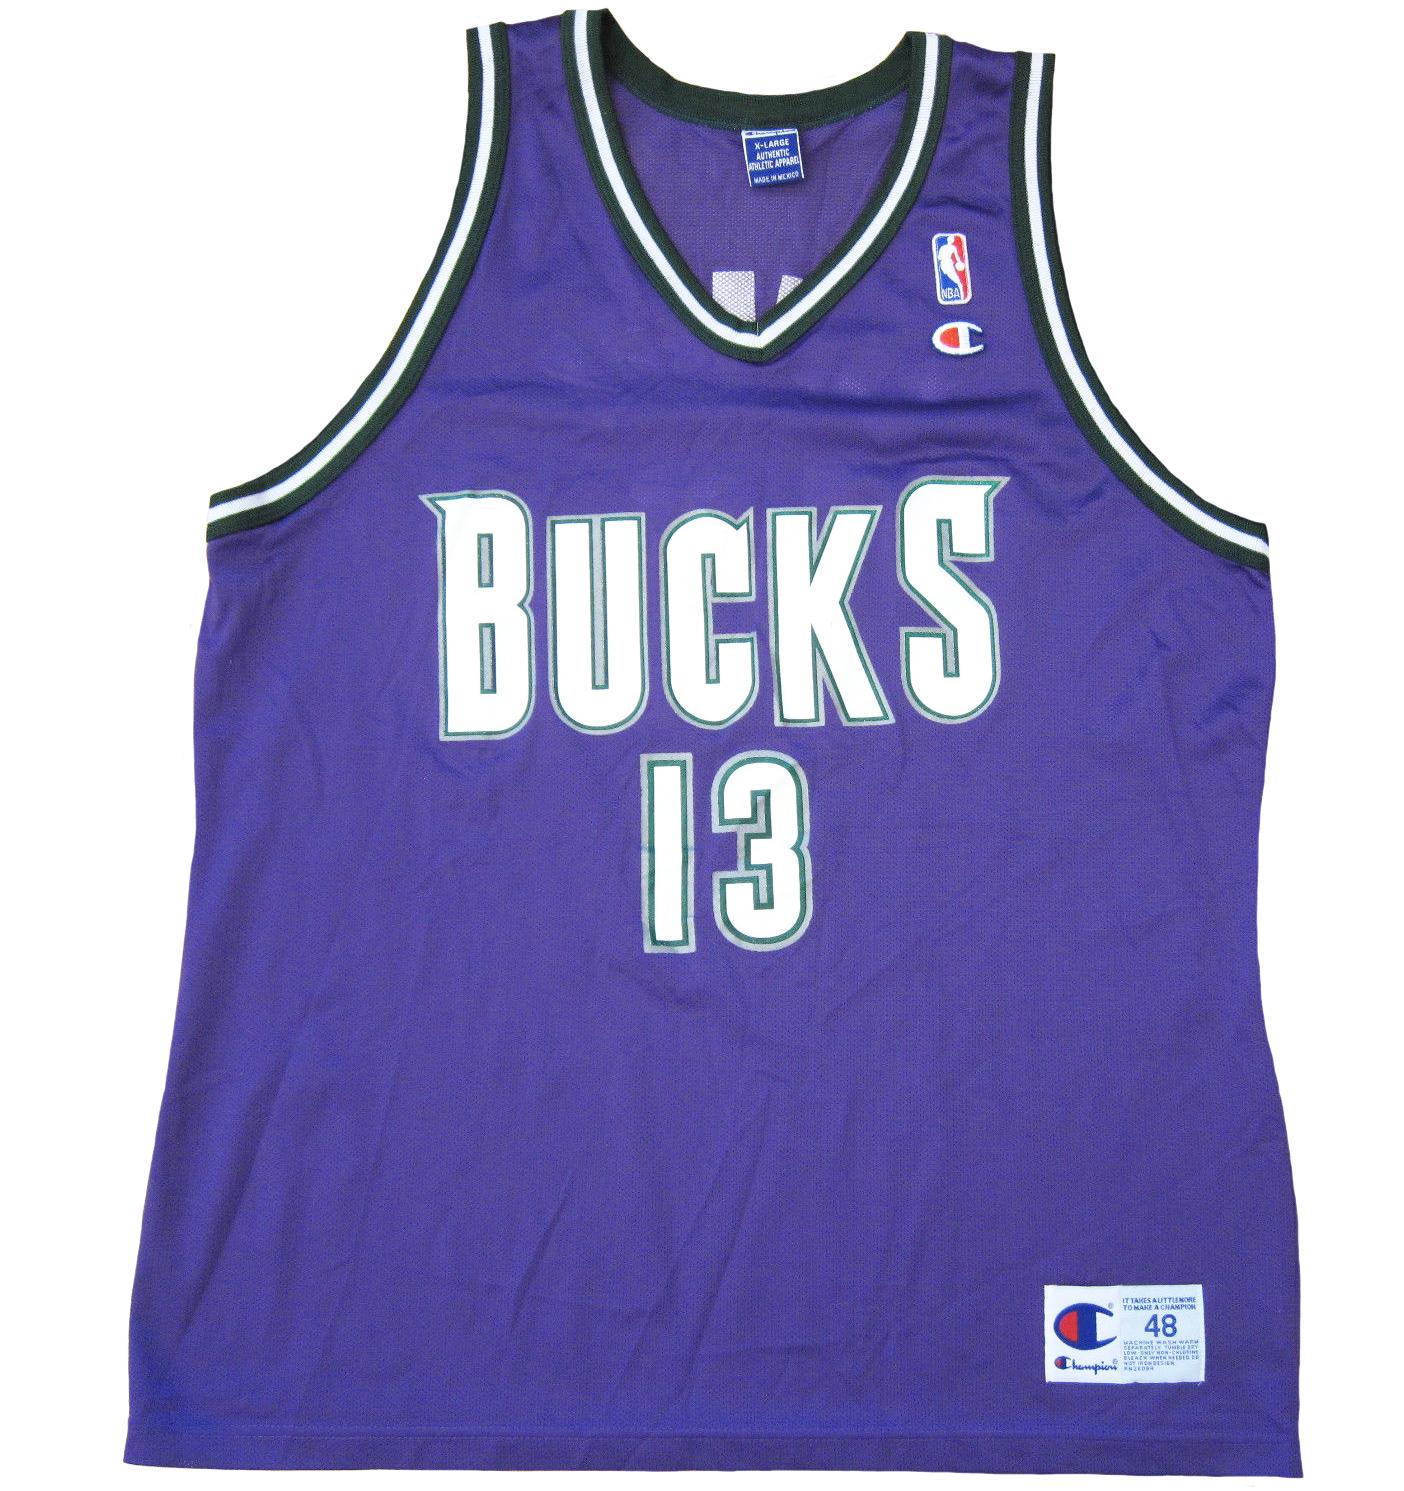 cb79a6a46 ... Glenn Robinson Bucks Purple Vneck front ... Image of Milwaukee Bucks  Glenn Robinson Champion Jersey ...